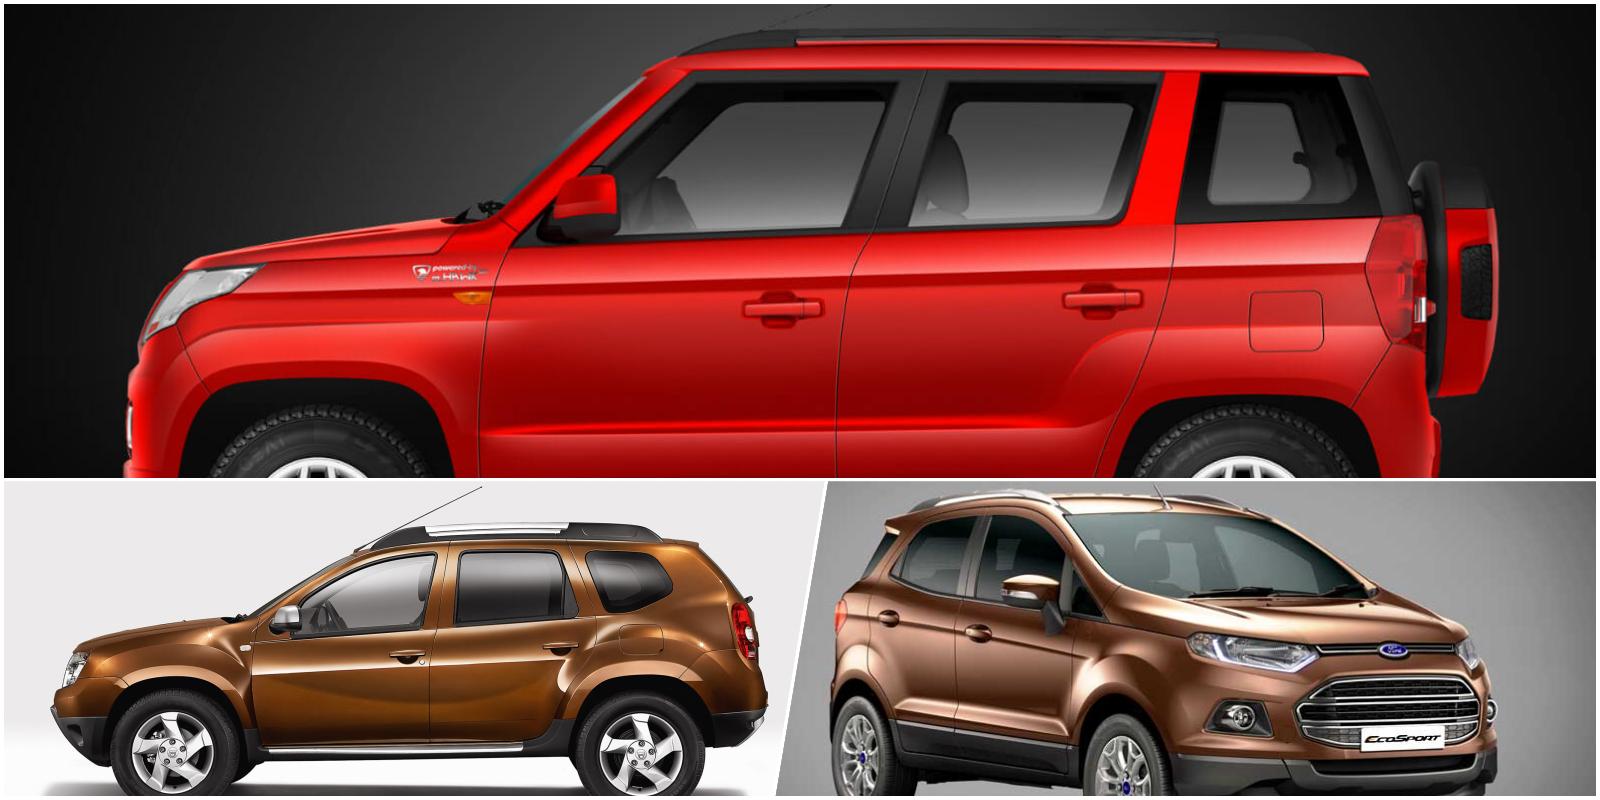 Mahindra TUV300 Vs. Ford EcoSport Vs. Renault Duster - Spec comparo